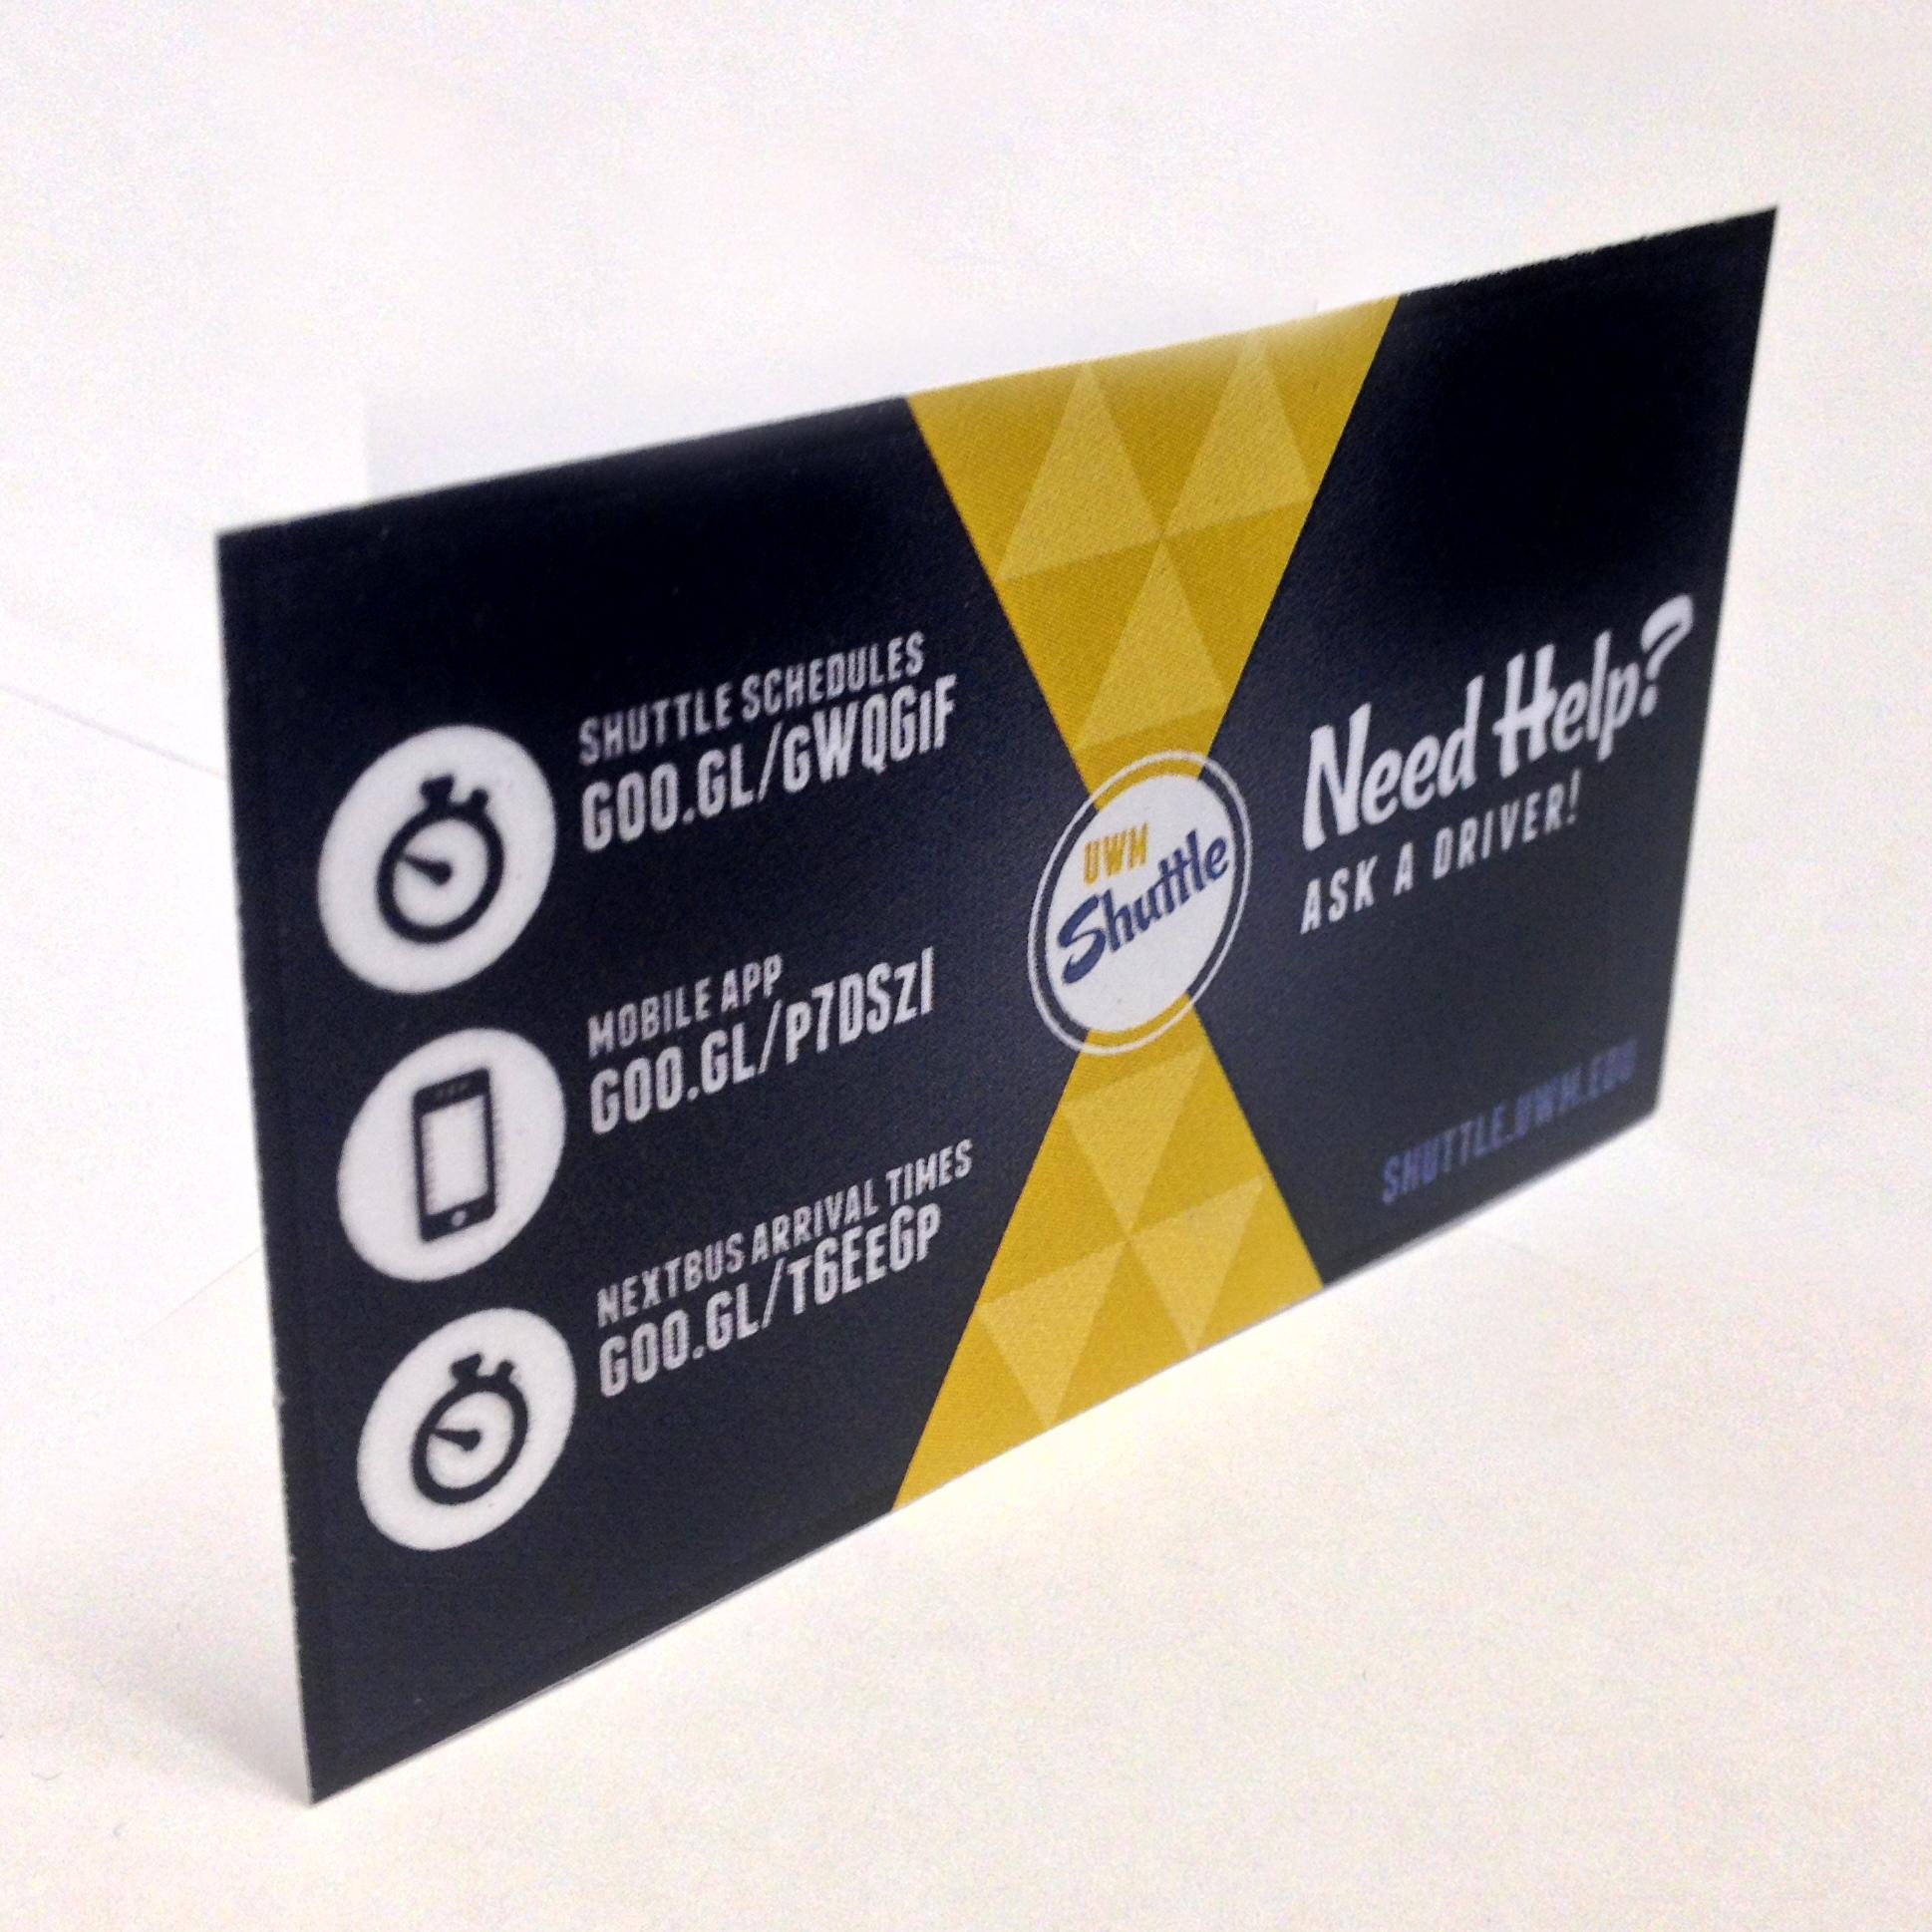 UWM shuttle help cards